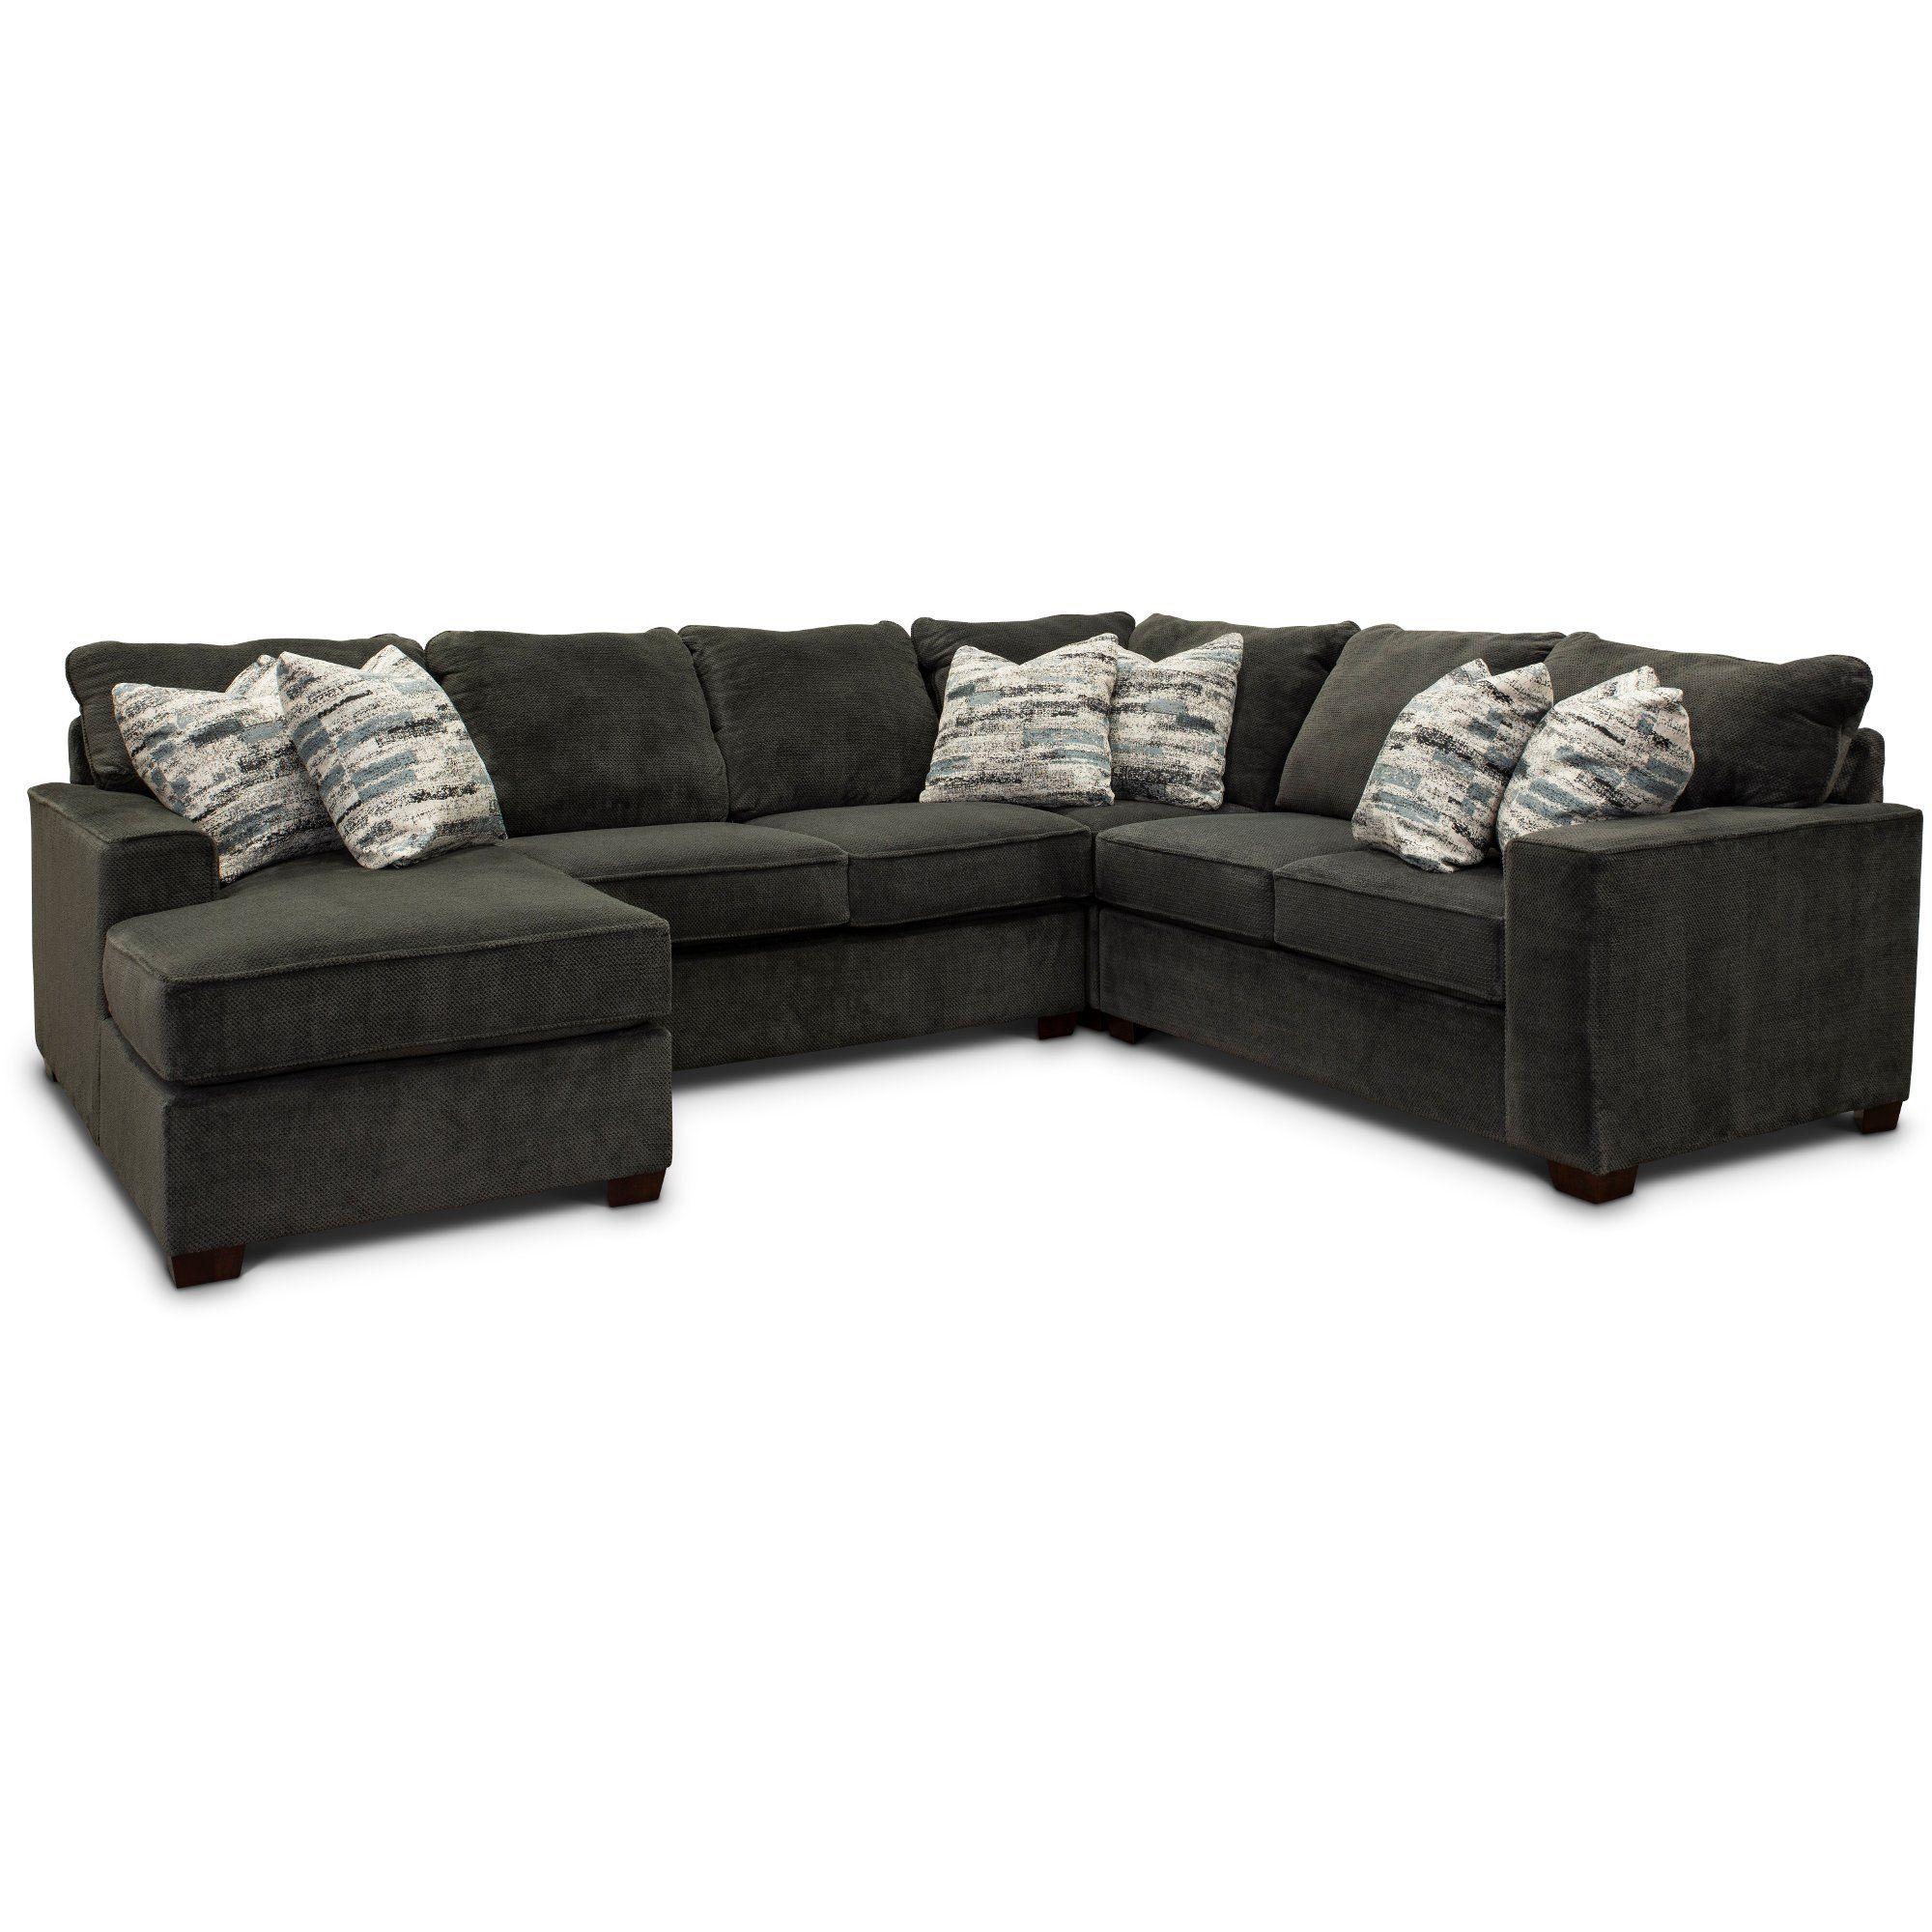 Dark Gray 4 Piece Sectional Sofa With Raf Loveseat Autumn